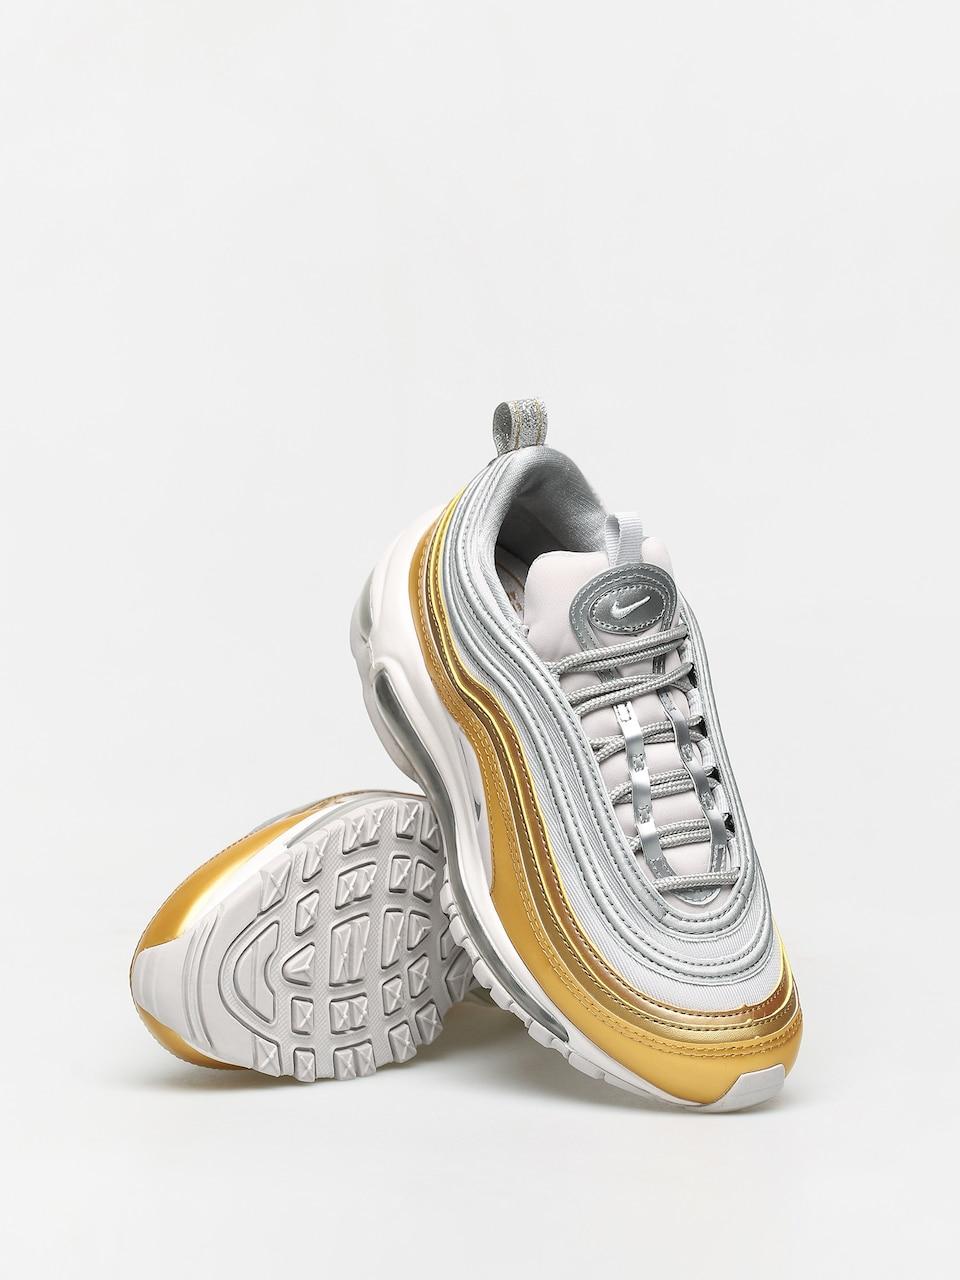 BUY Nike Air Max 97 Vast Grey Metallic Silver | Kixify